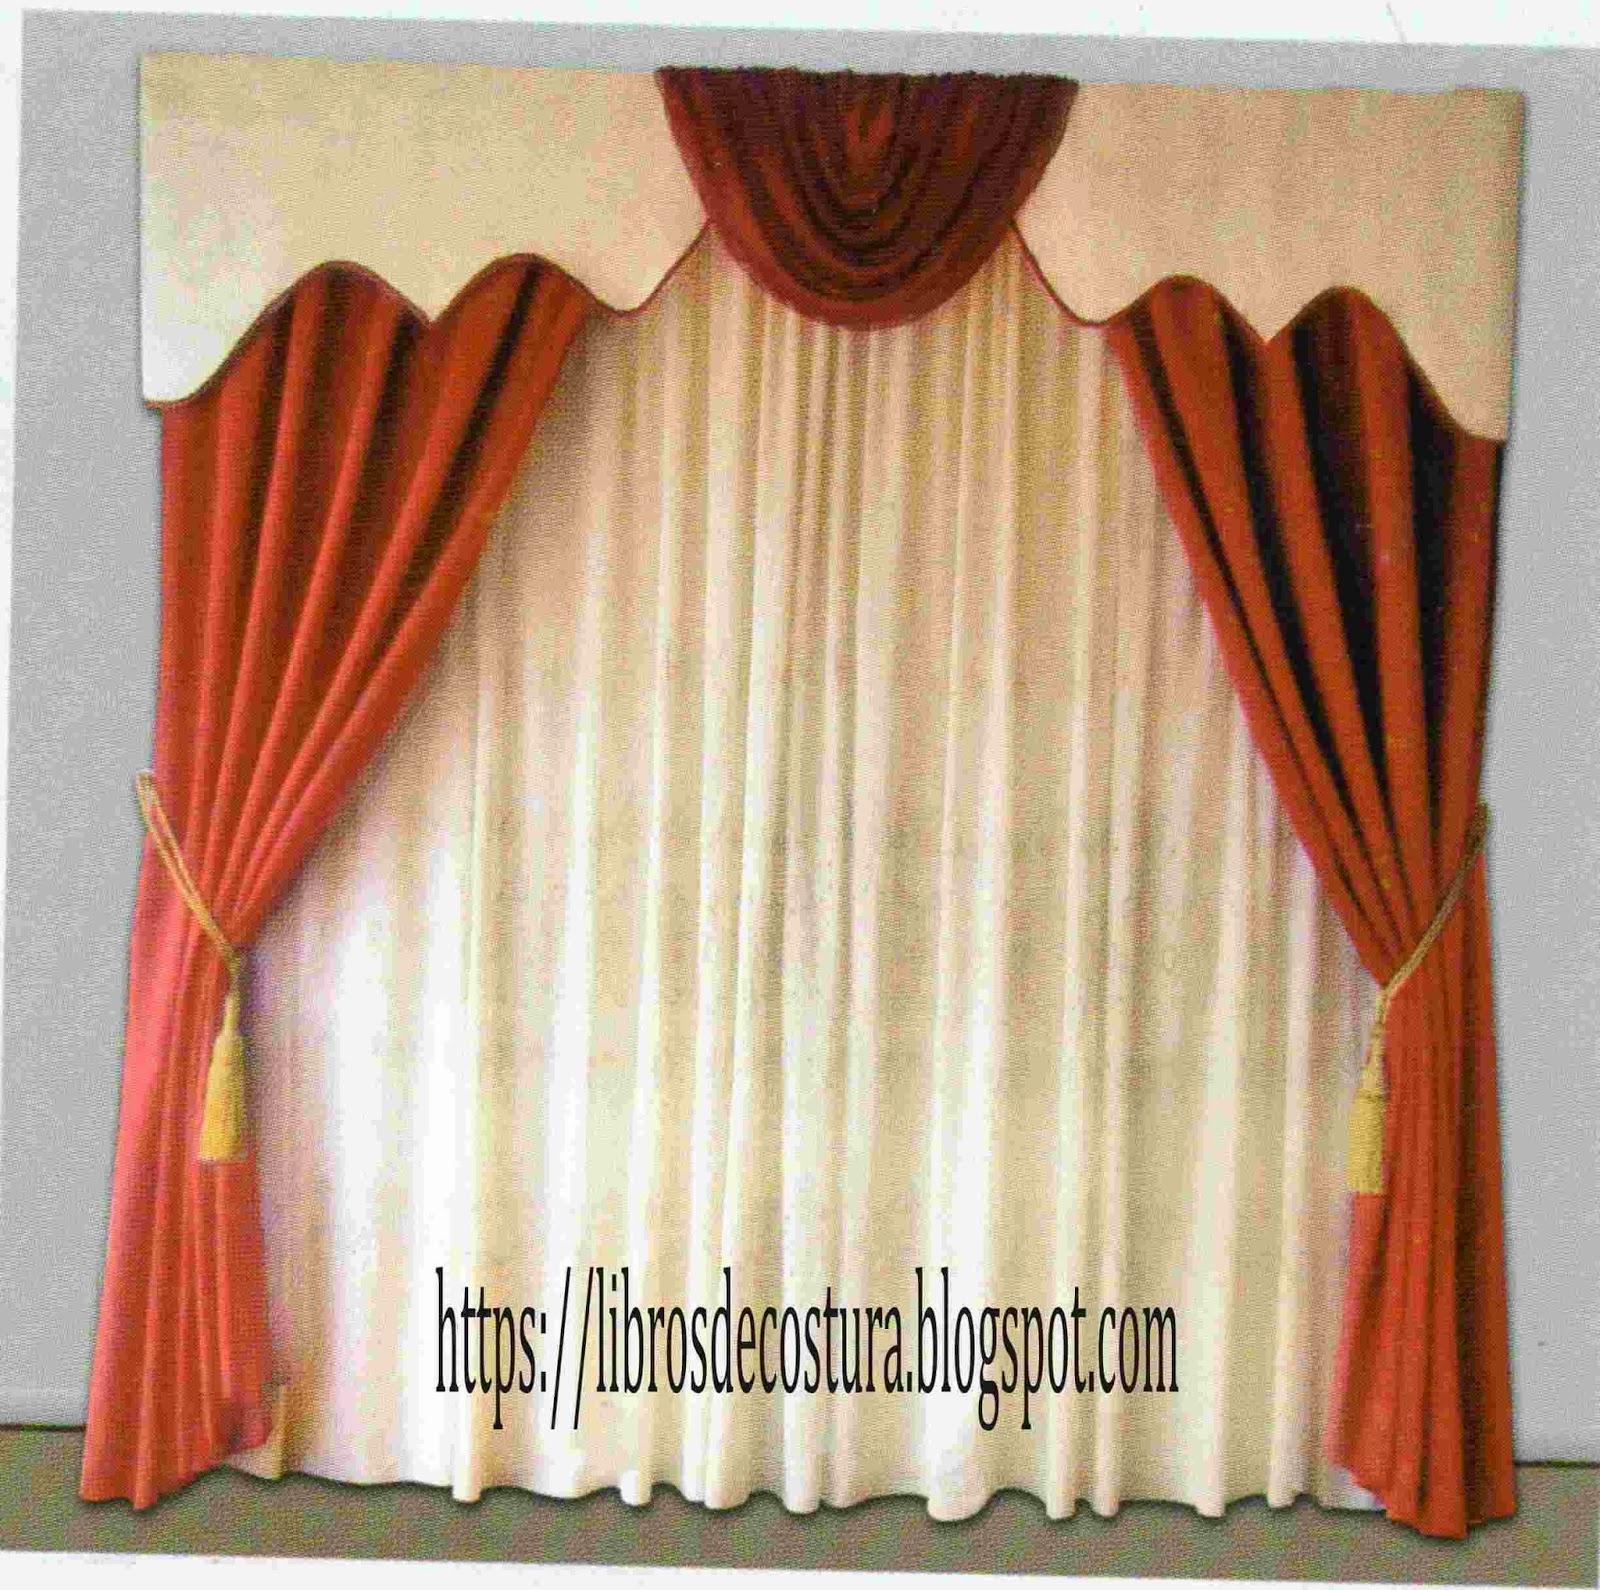 Libros de Costura Como hacer cortinas paso a paso